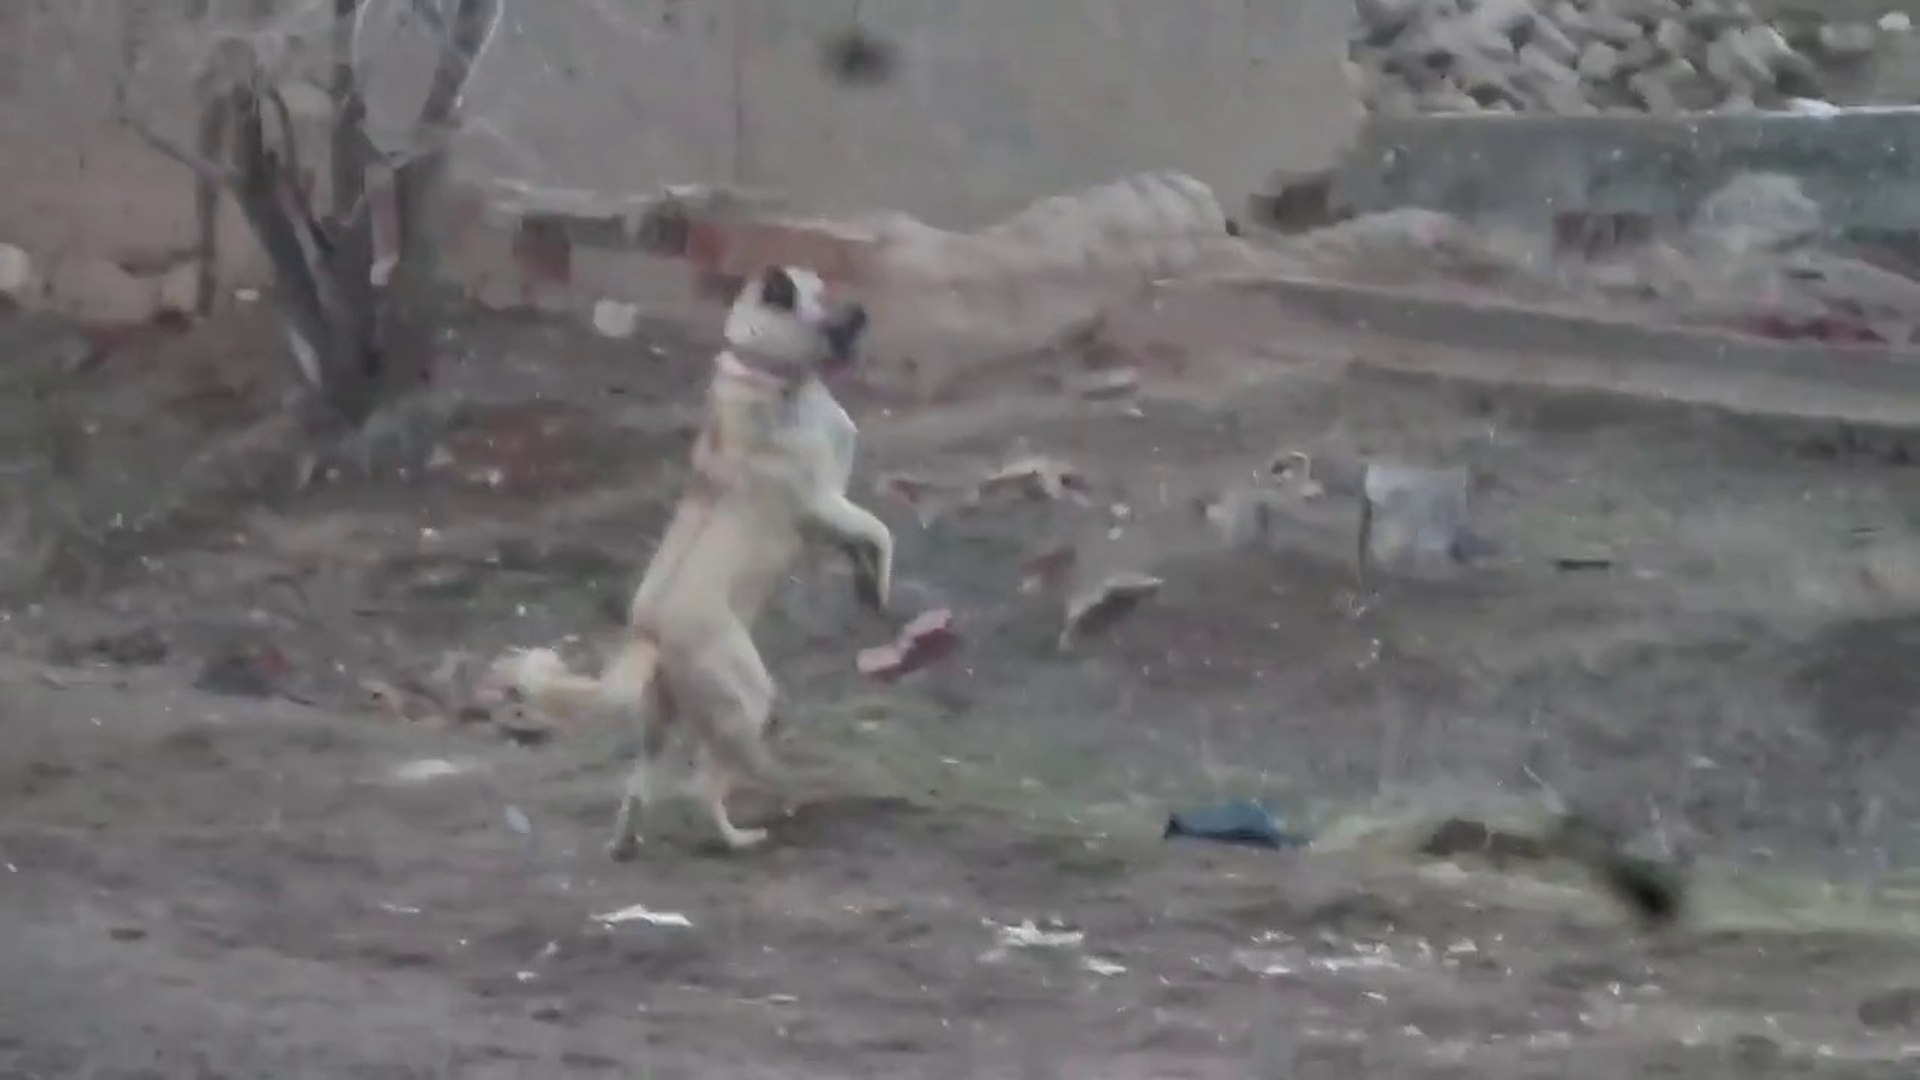 DEV ADAMCI KOPEGiNDEN ADAMCI HAREKETLER - ANGRY GiANT SHEPHERD DOG in GARDEN